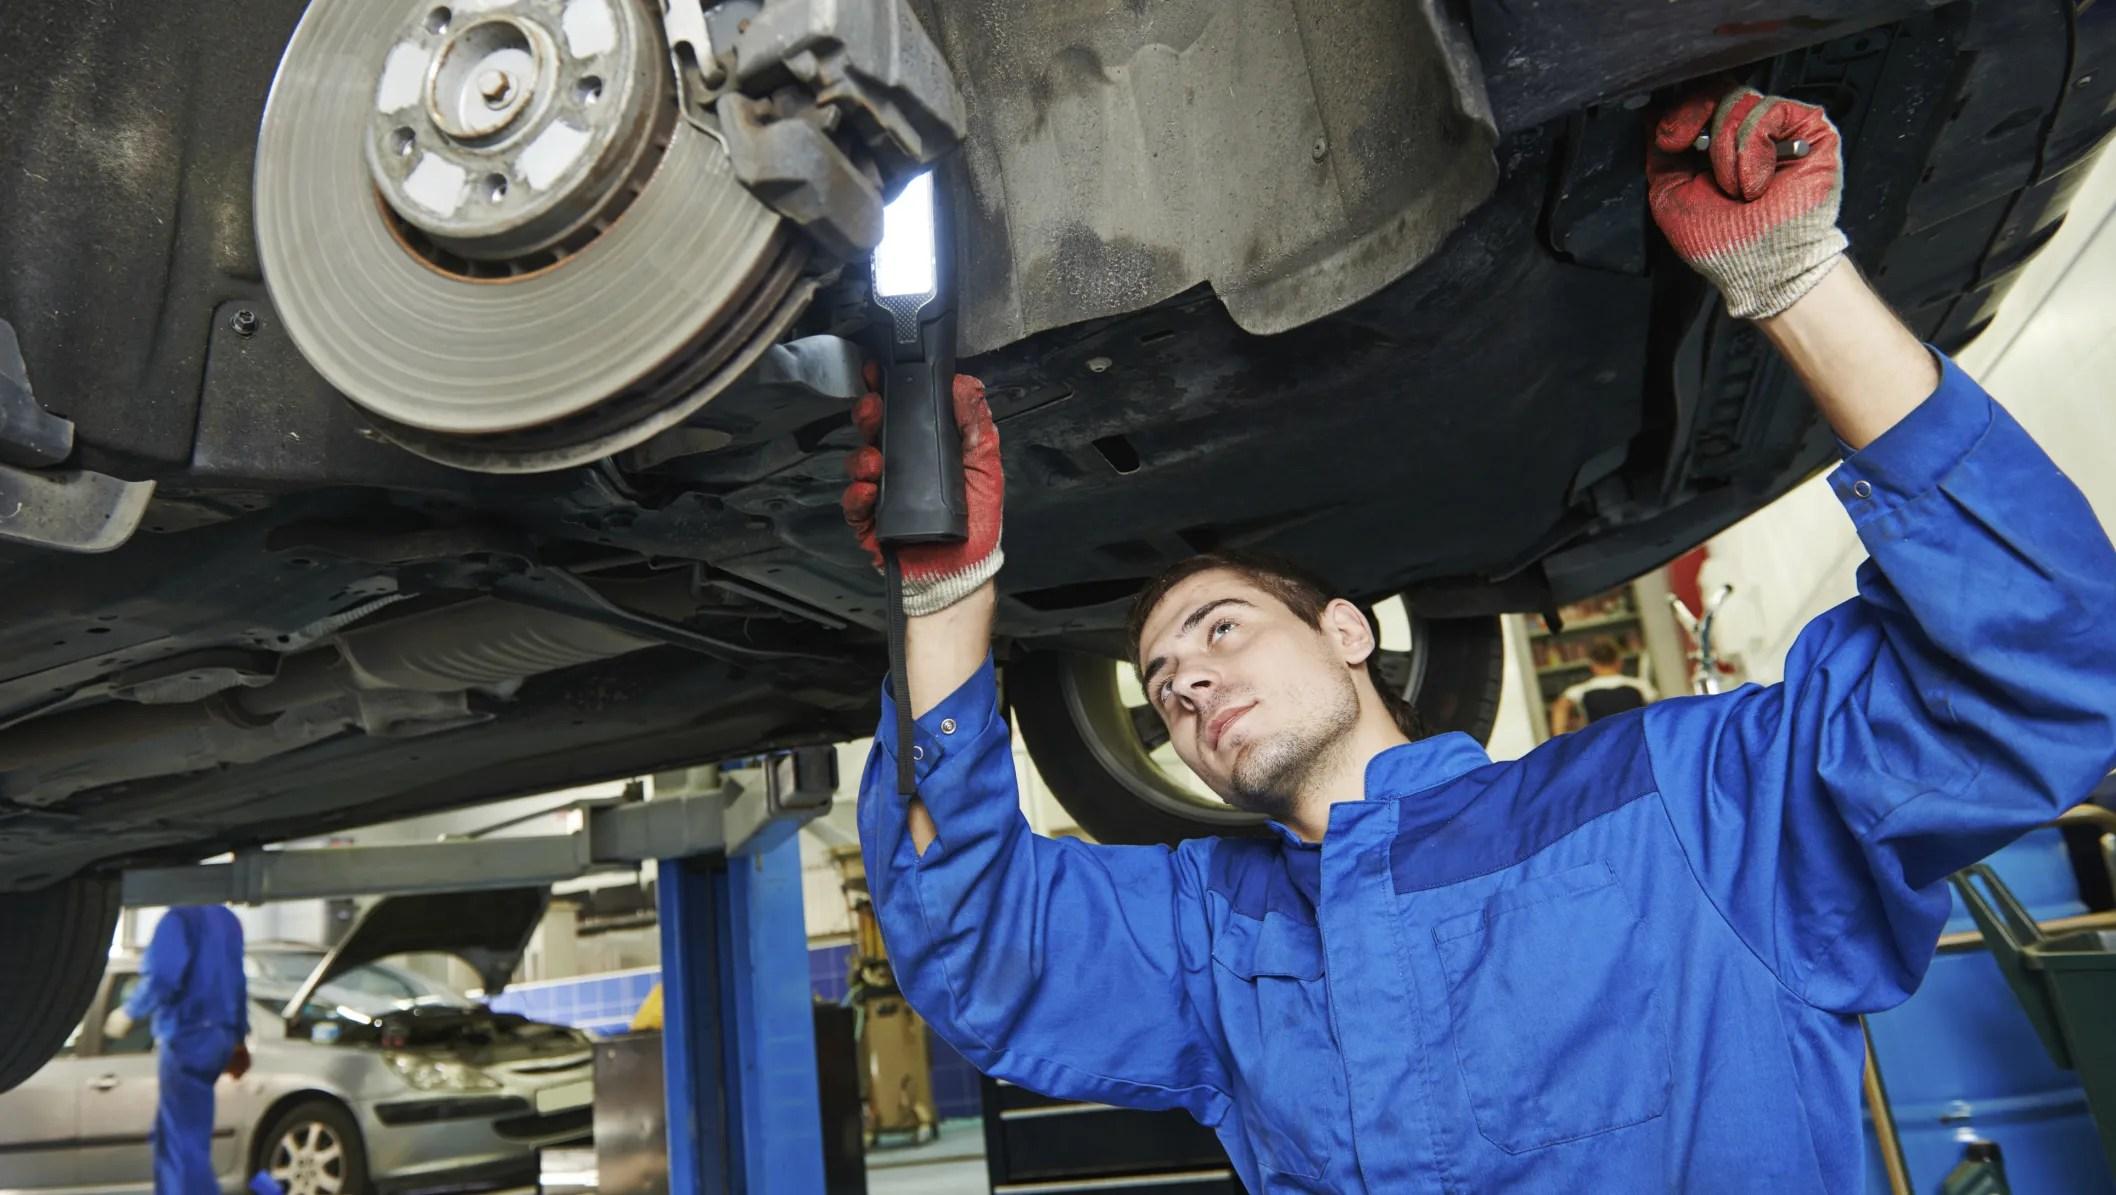 5 Reasons Insurance Company May Reject Car Repair Estimate